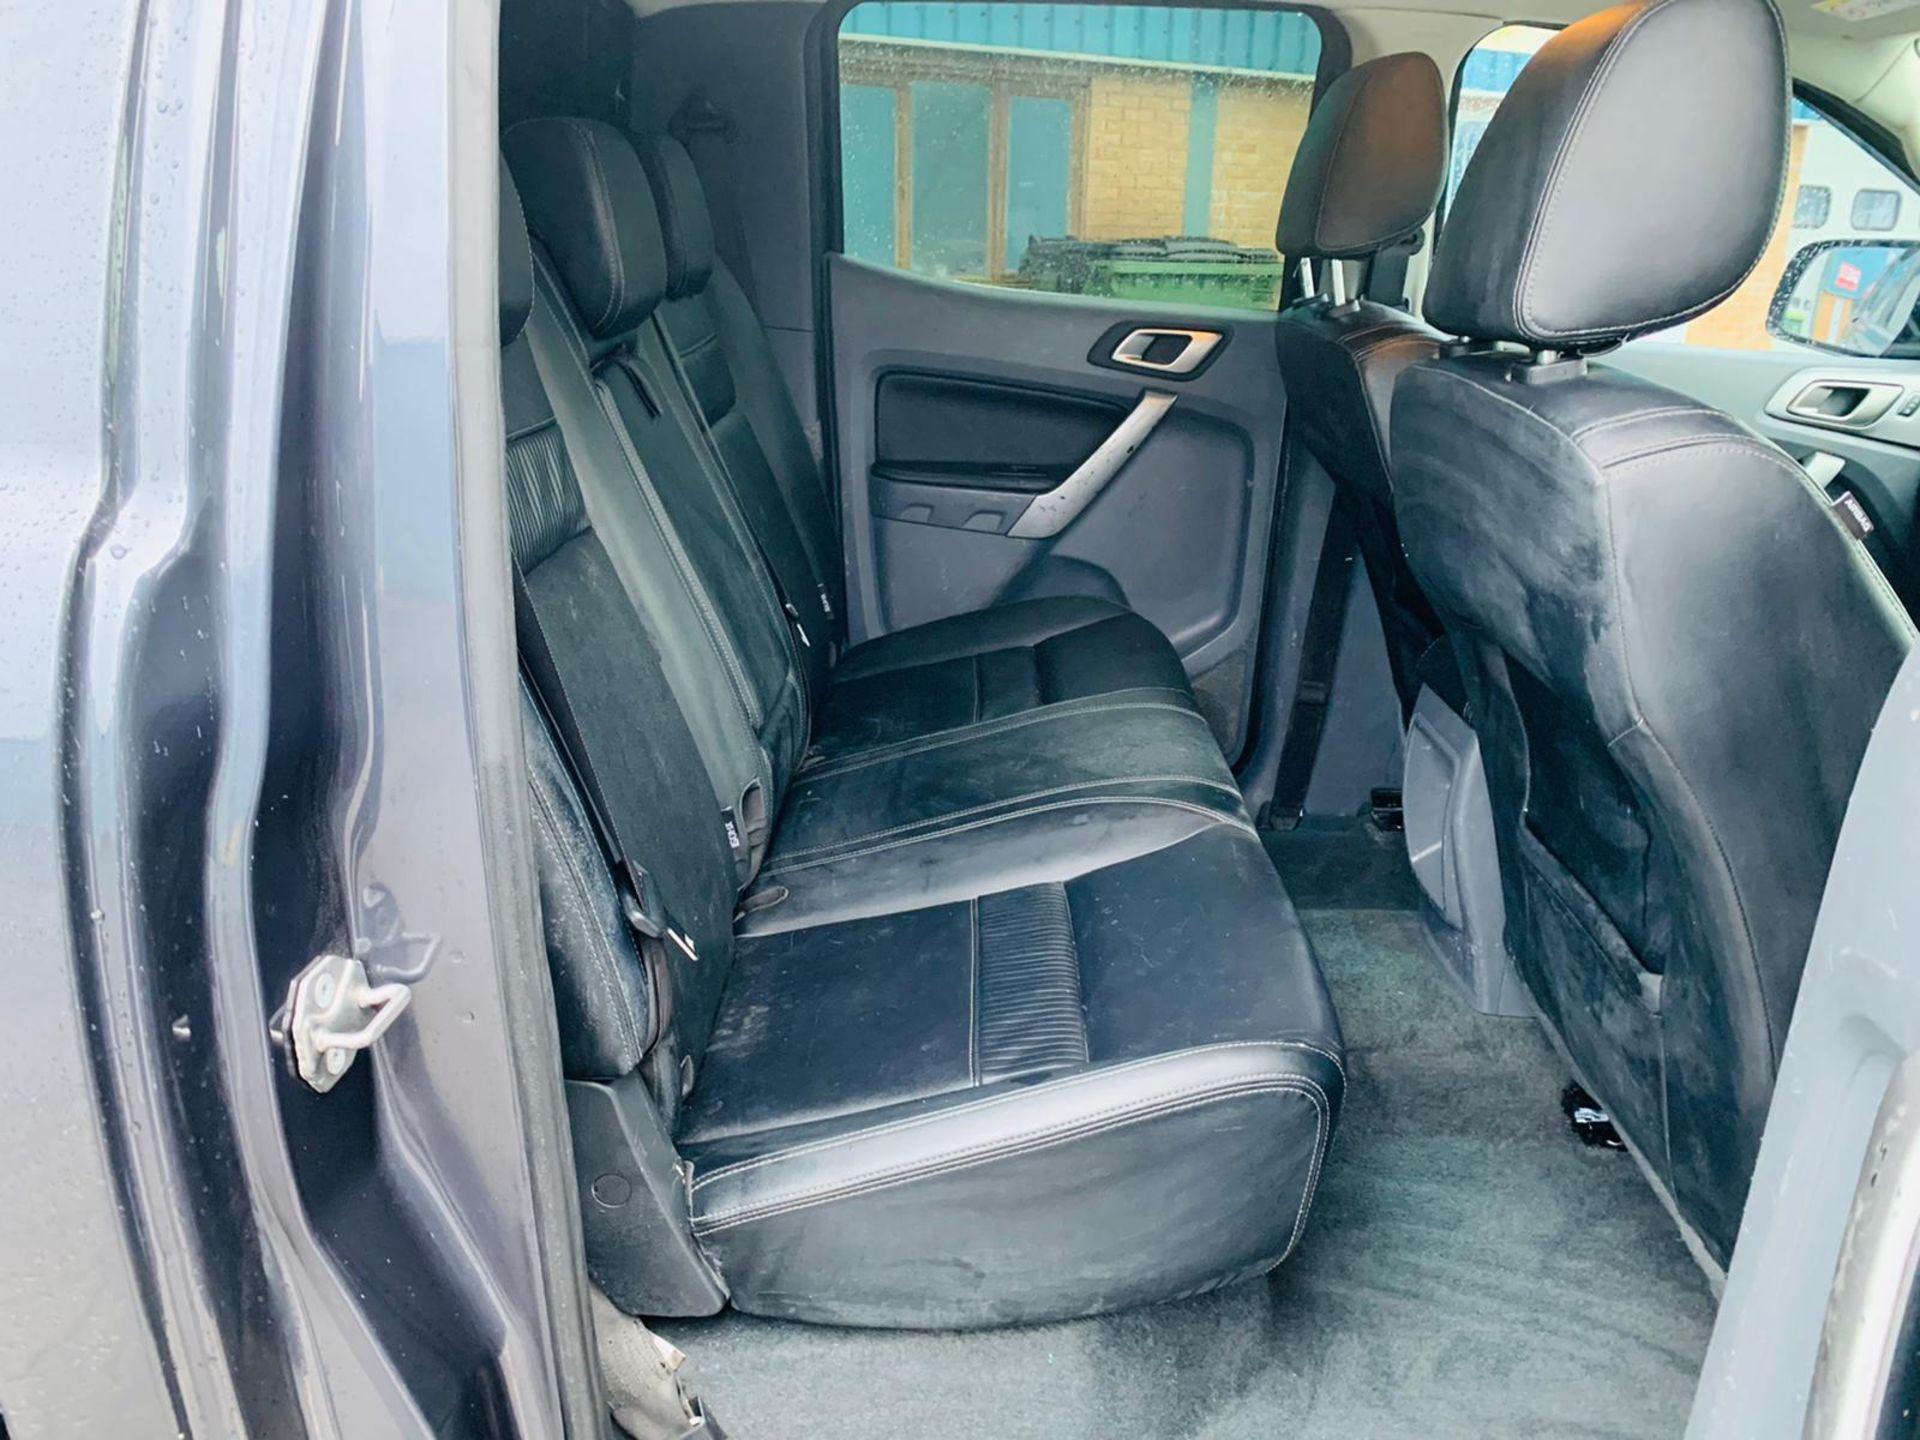 (RESERVE MET) Ford Ranger 2.2 TDCI LTD 4x4 Double Cab 2017 17 Reg - Reversing Cam -Leather - Sat Nav - Image 31 of 32